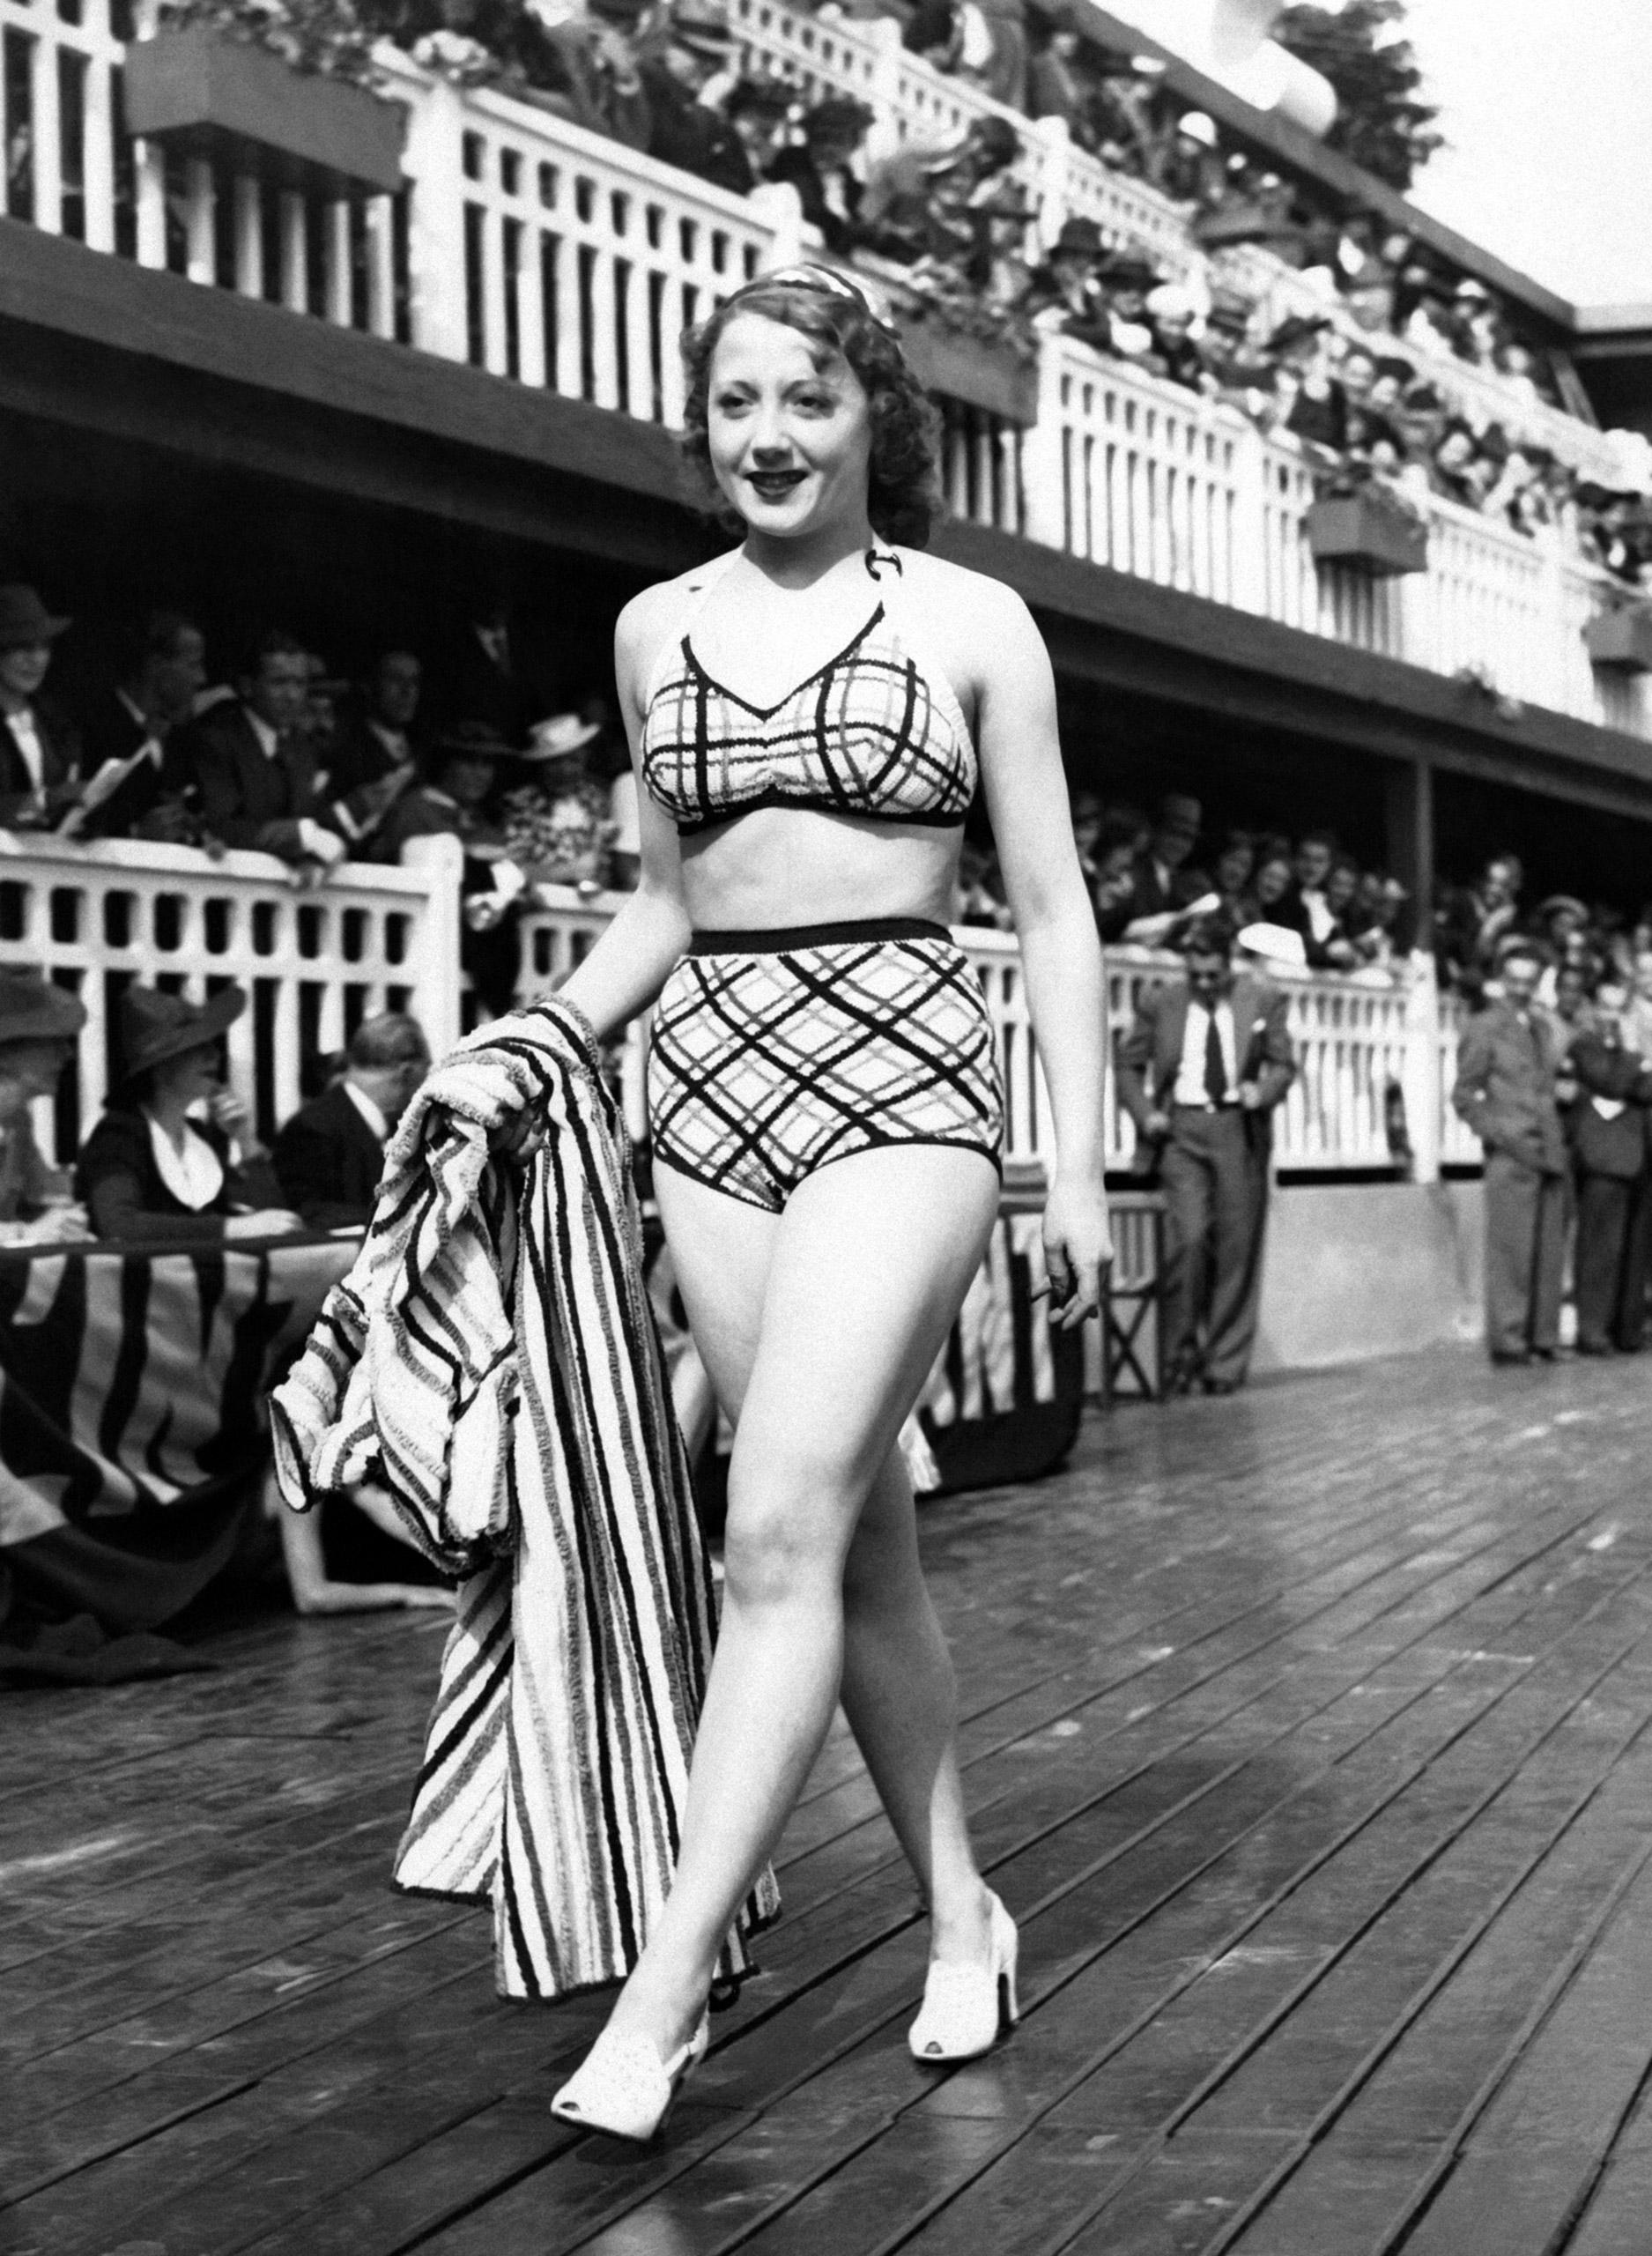 Swimsuit fashion in Paris, France, circa 1930.